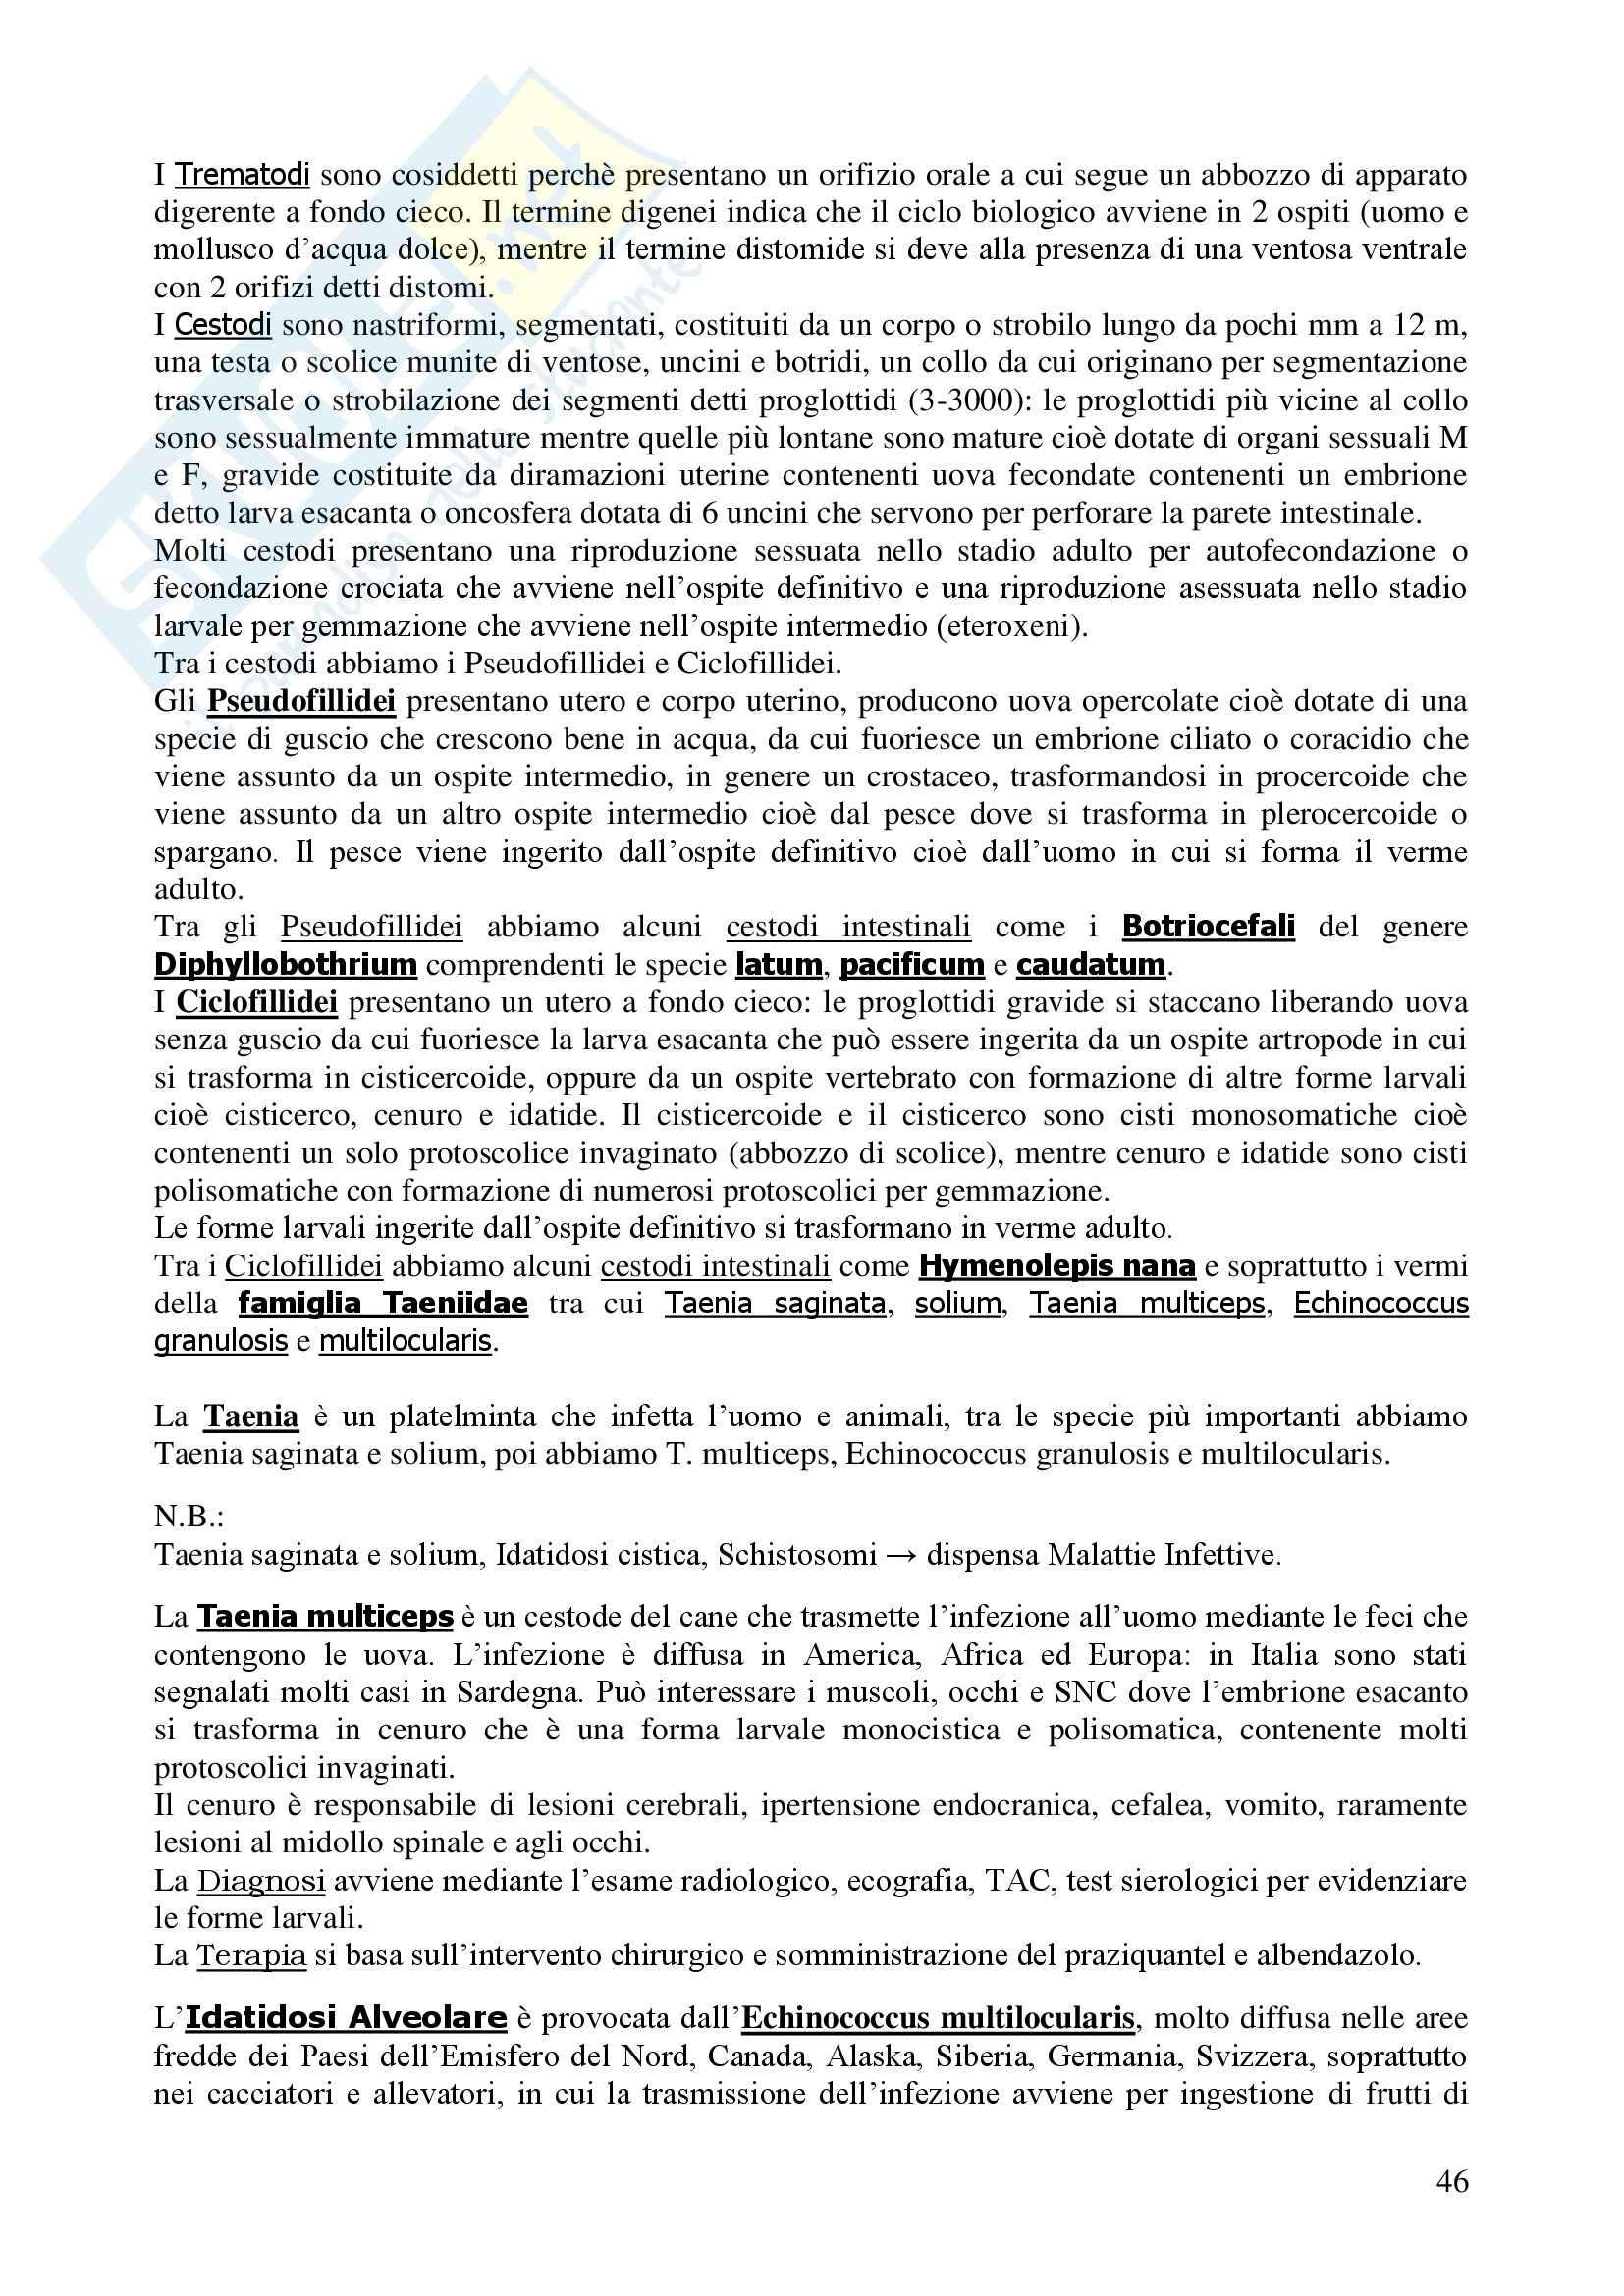 Microbiologia I e II - Corso completo Pag. 46